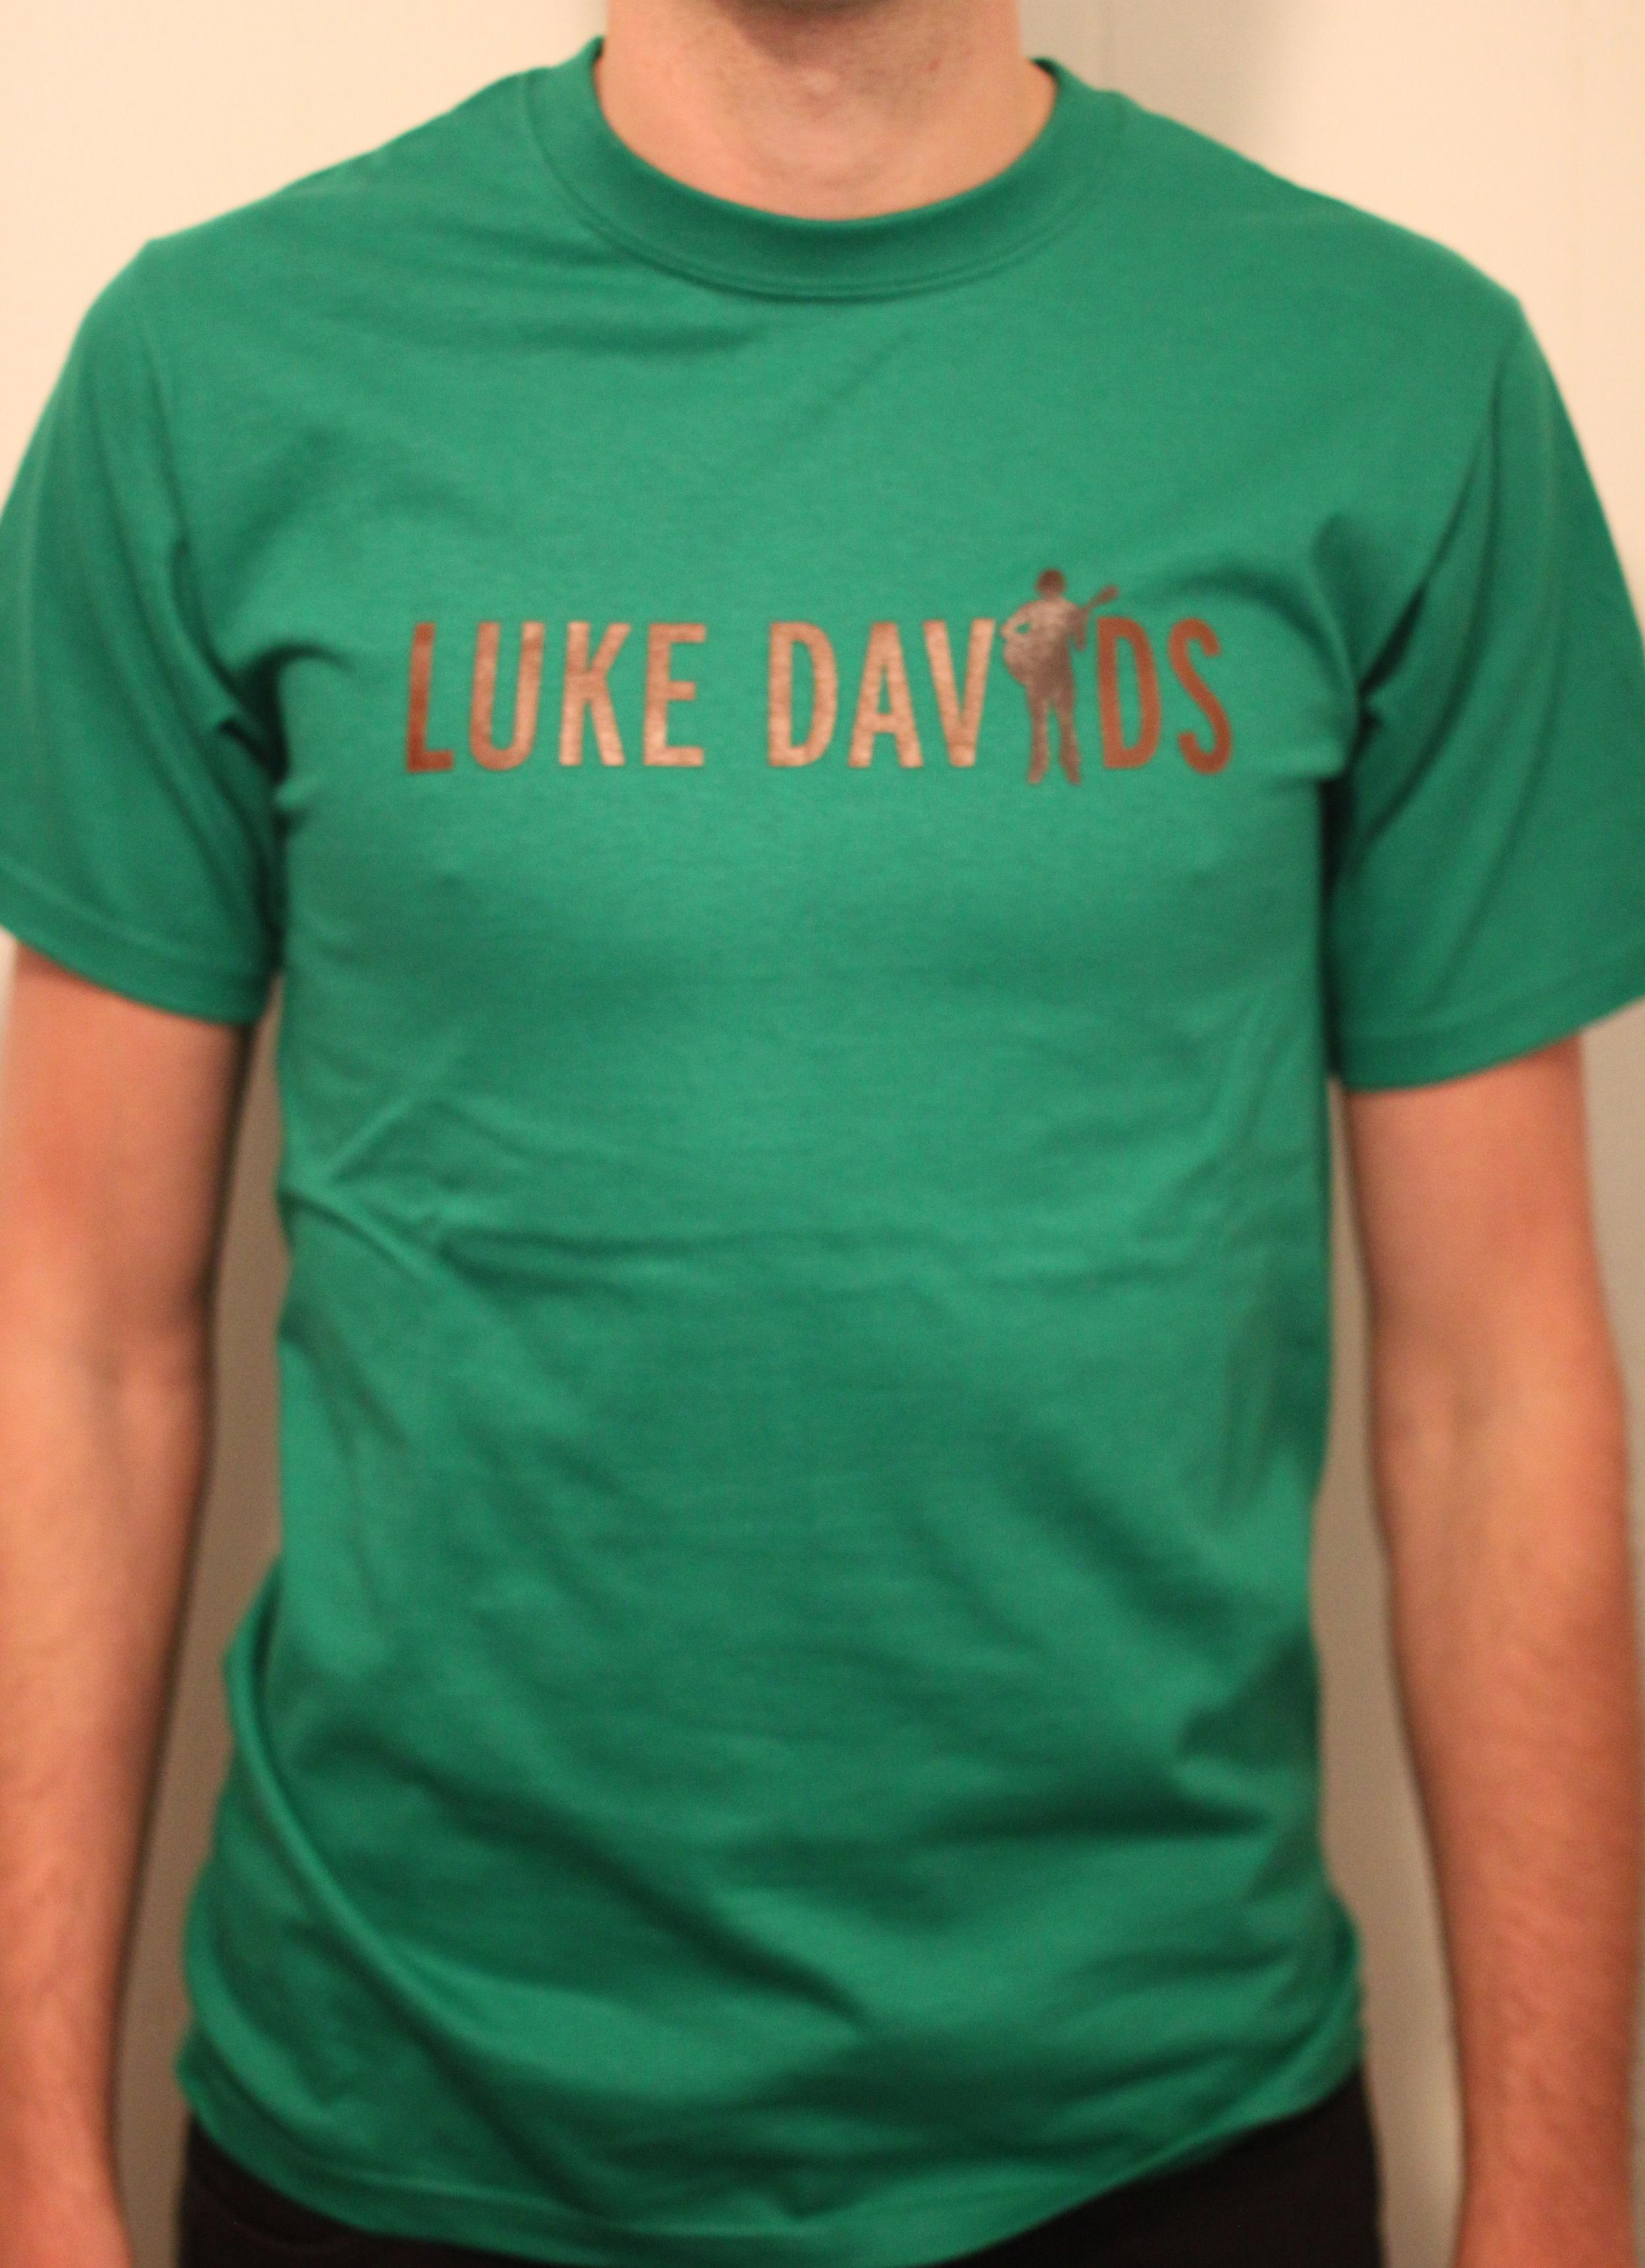 Luke Davids Tee Shirt Green